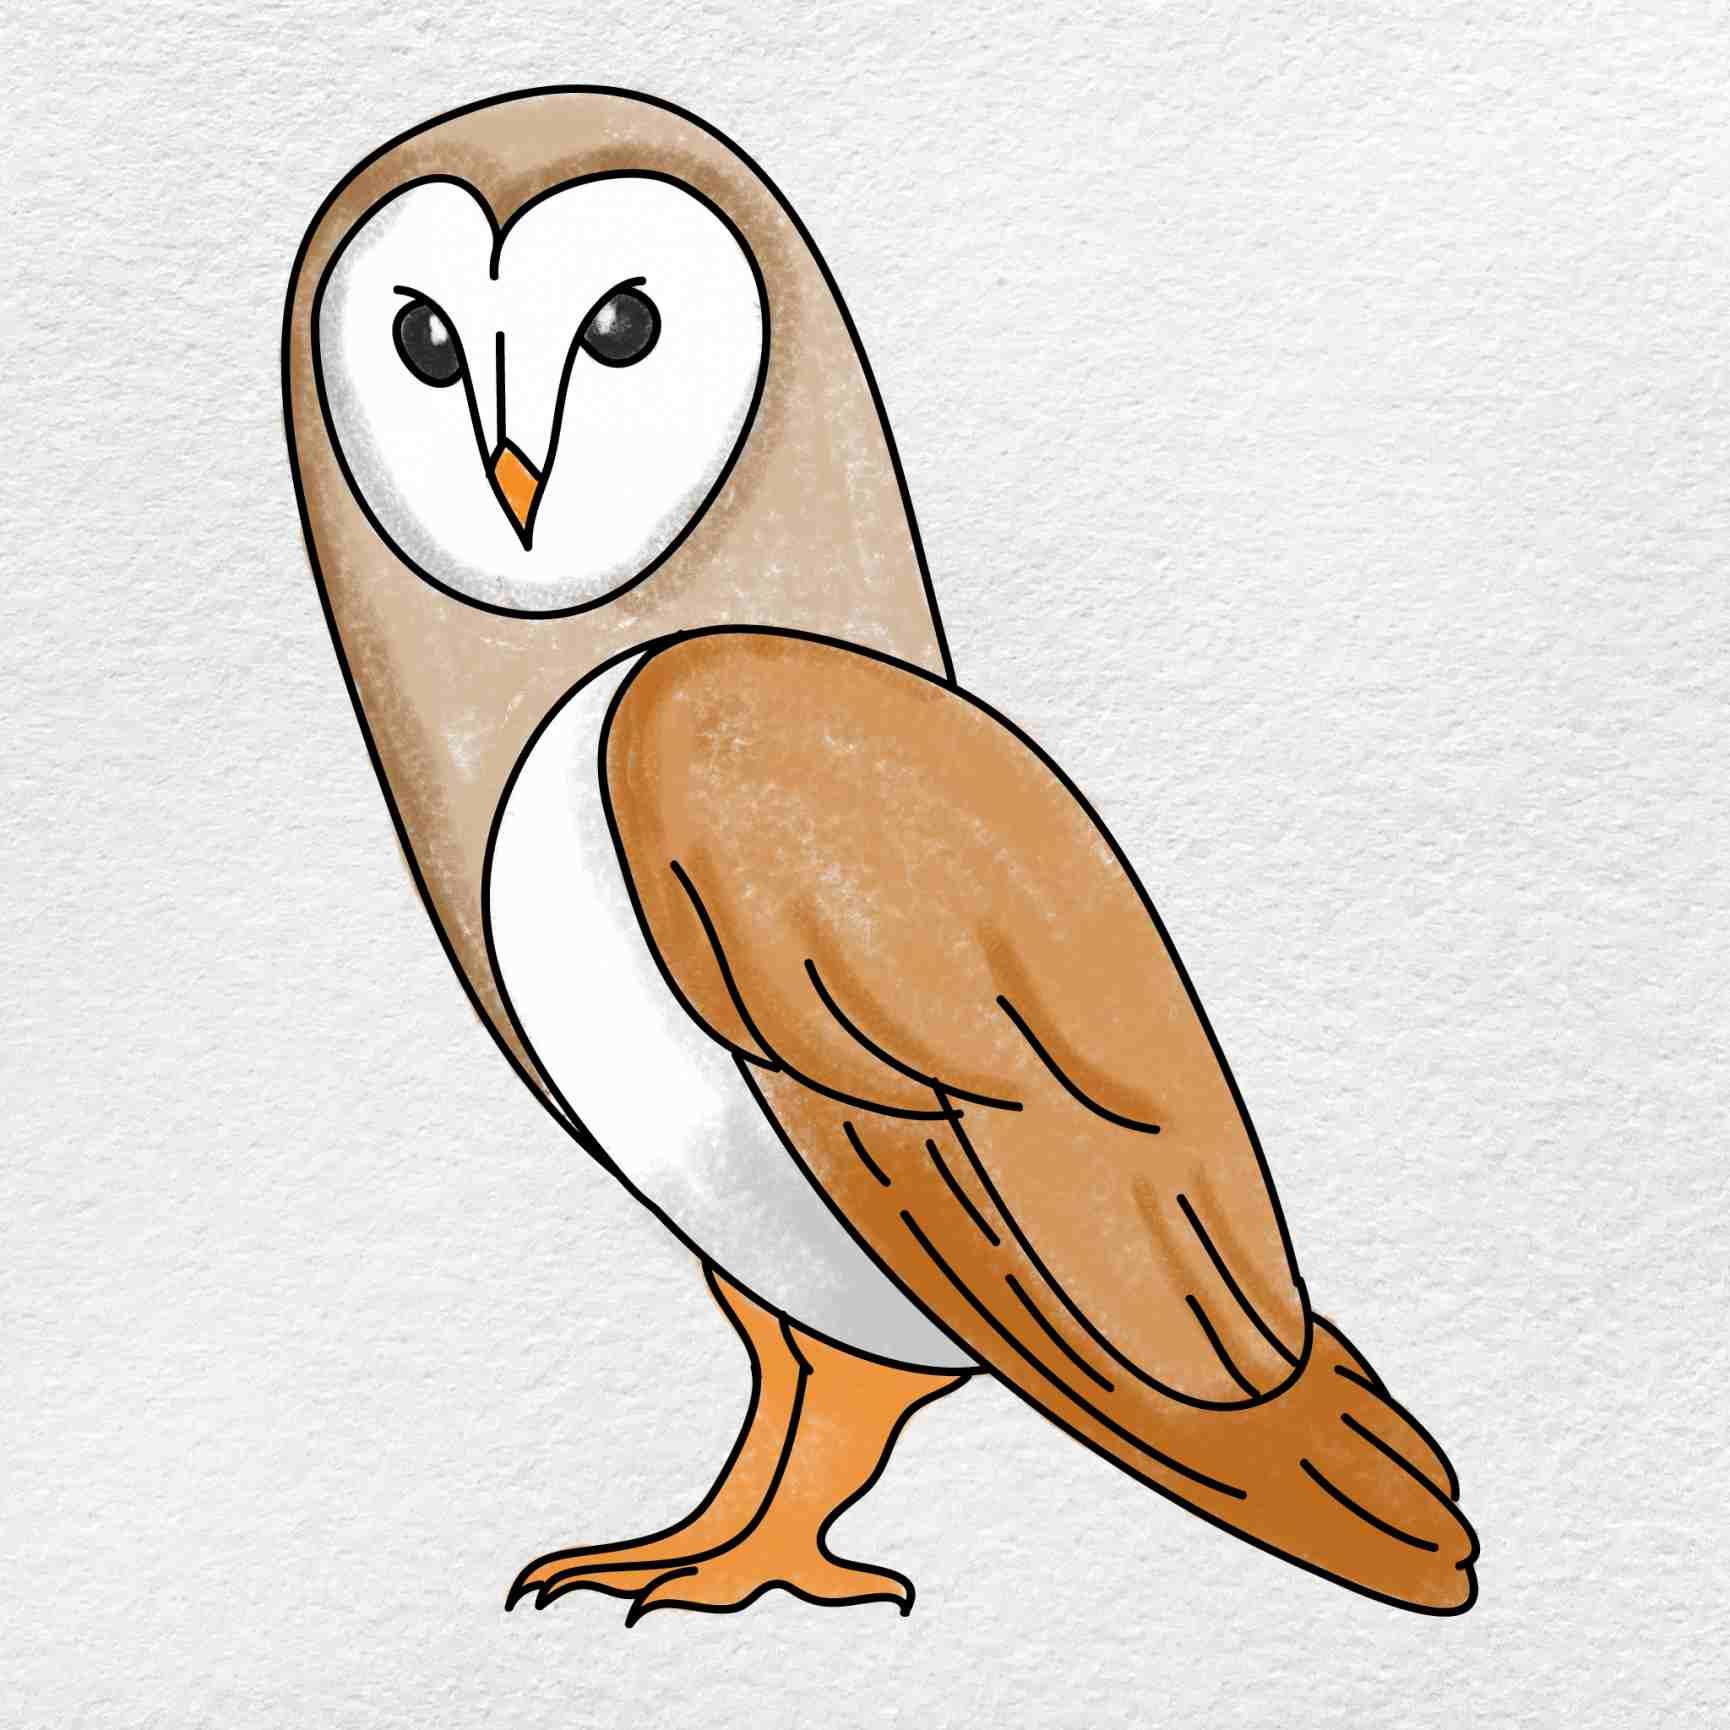 Barn Owl Drawing: Step 9